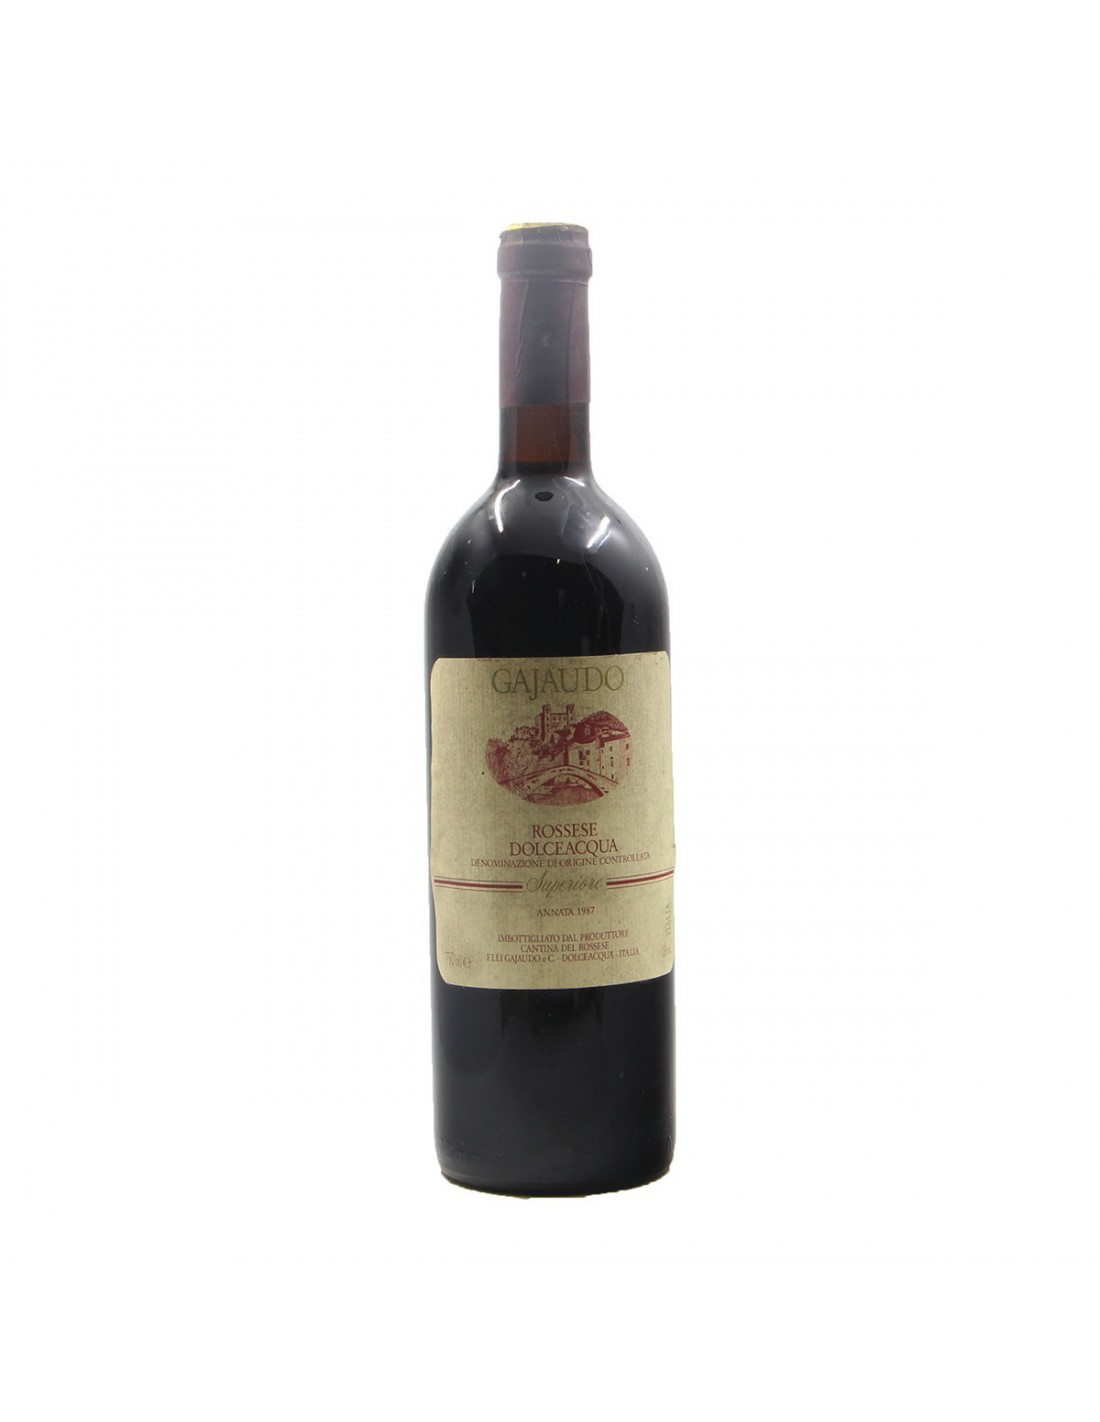 ROSSESE DOLCEACQUA SUPERIORE 1987 GAJAUDO Grandi Bottiglie